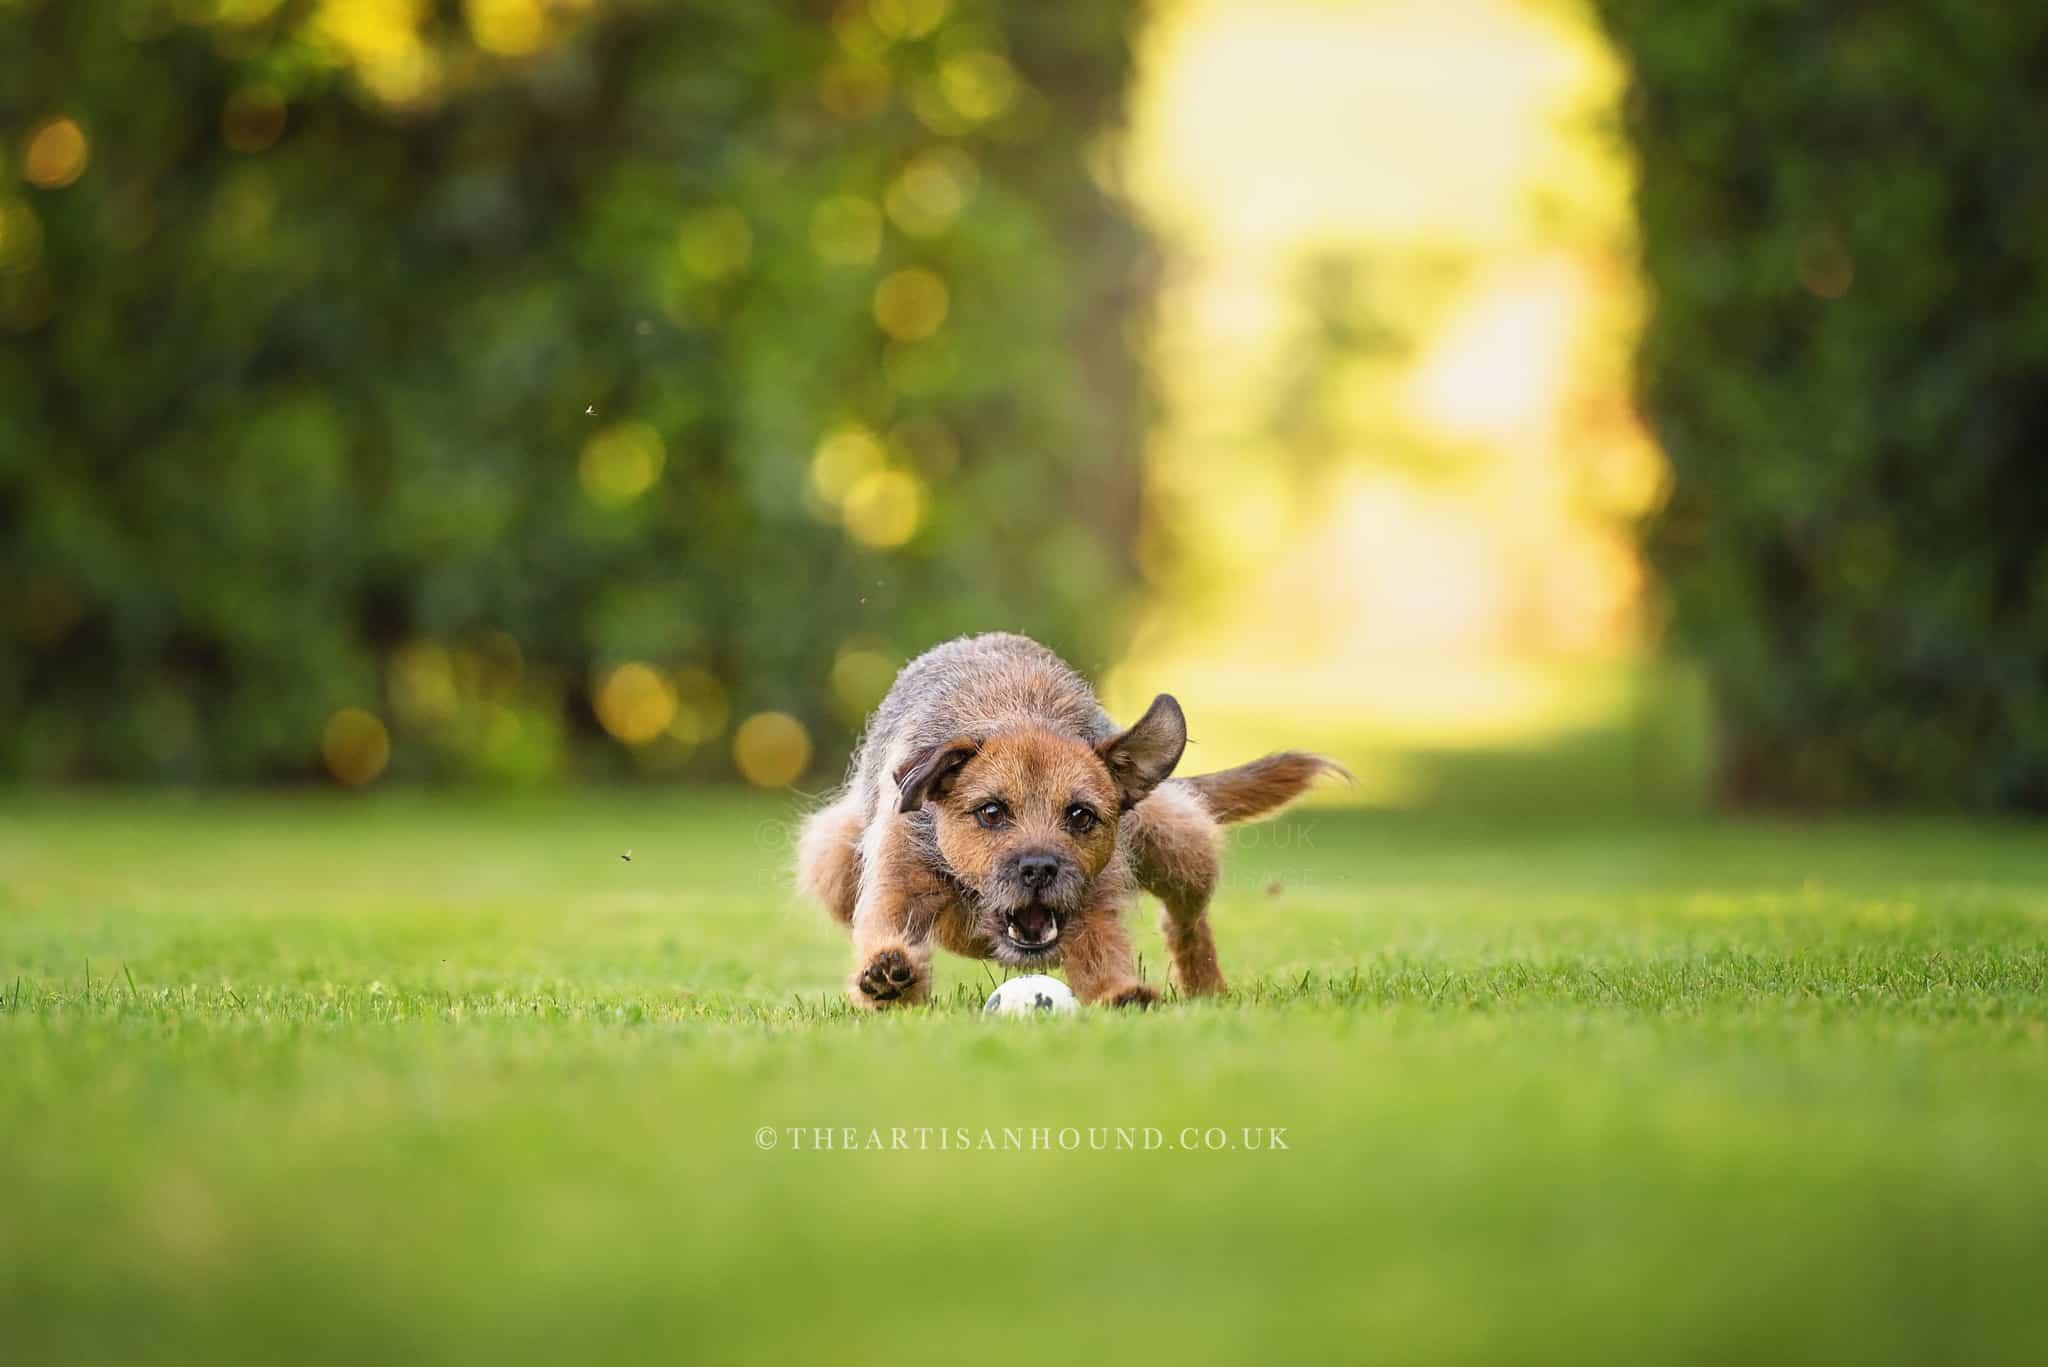 border-terrier-catching-ball-in-garden